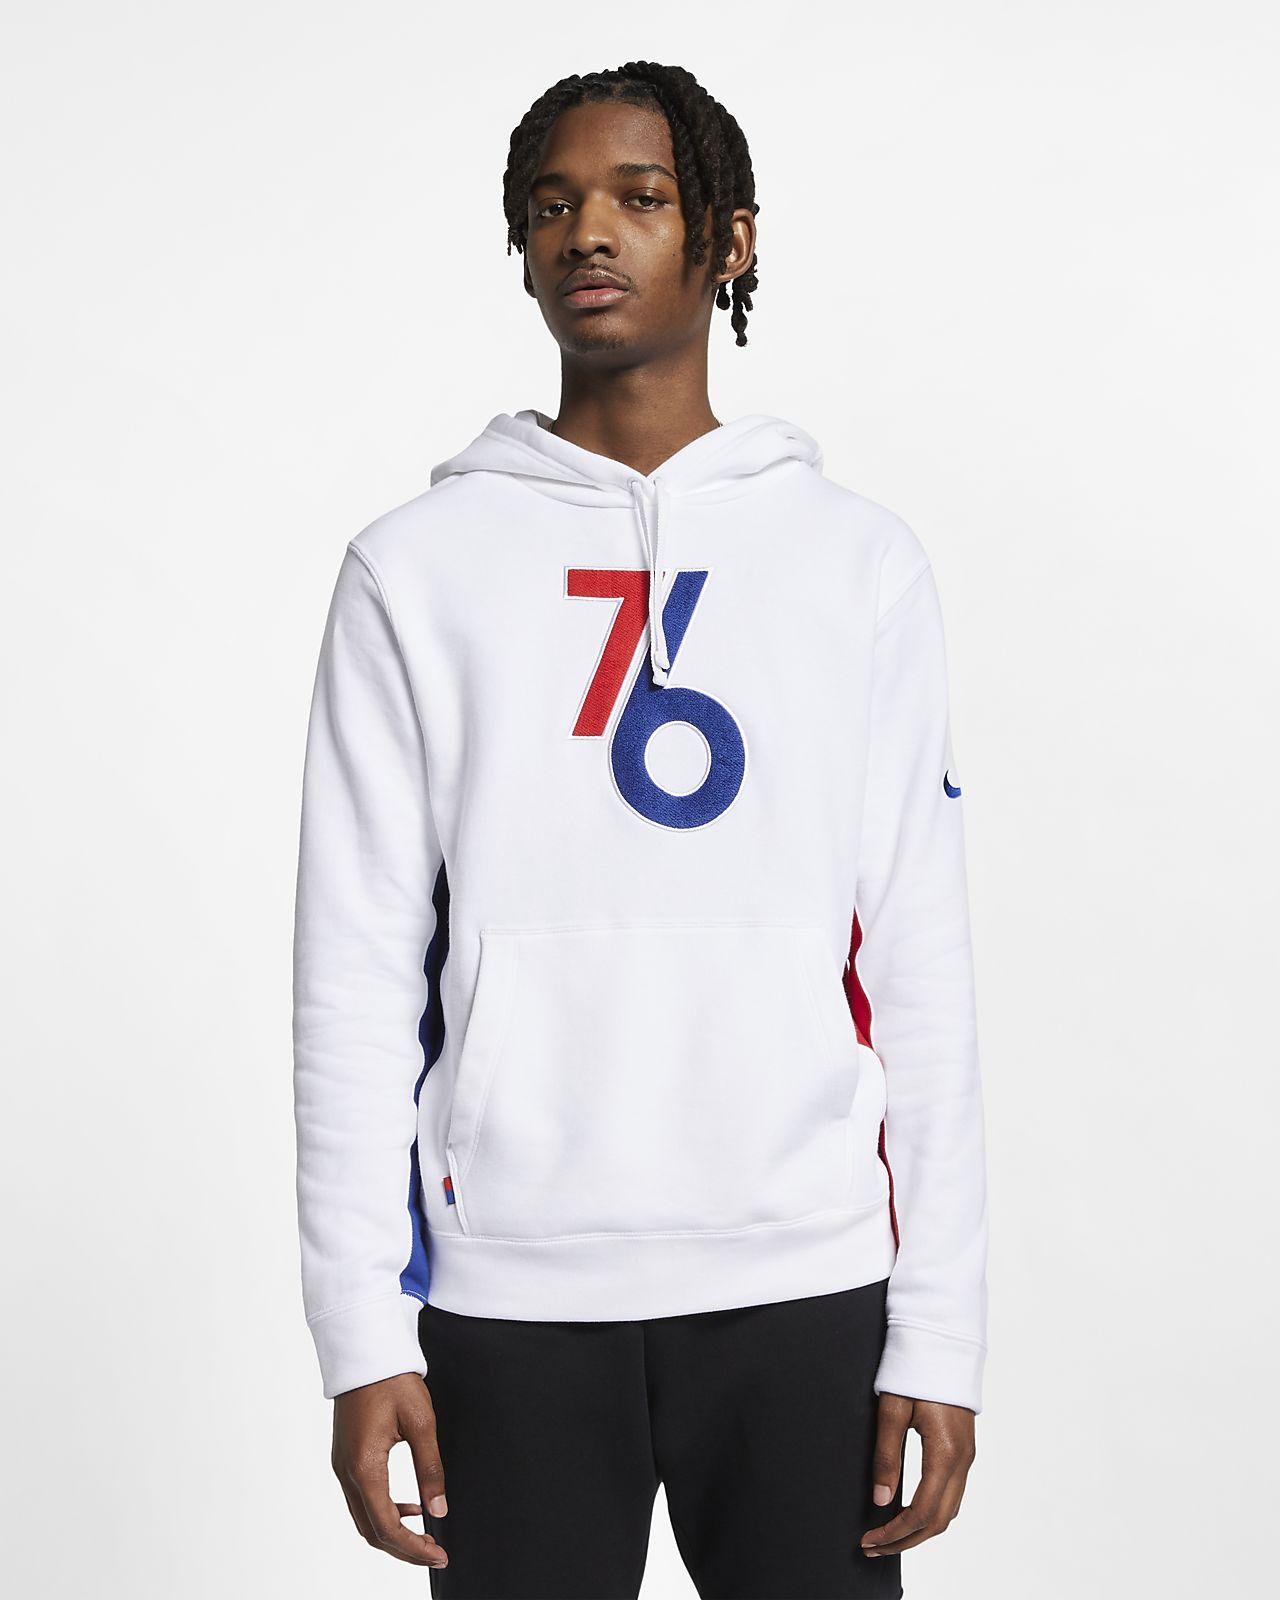 d9eddd5200 Philadelphia 76ers Nike Men's NBA Hoodie